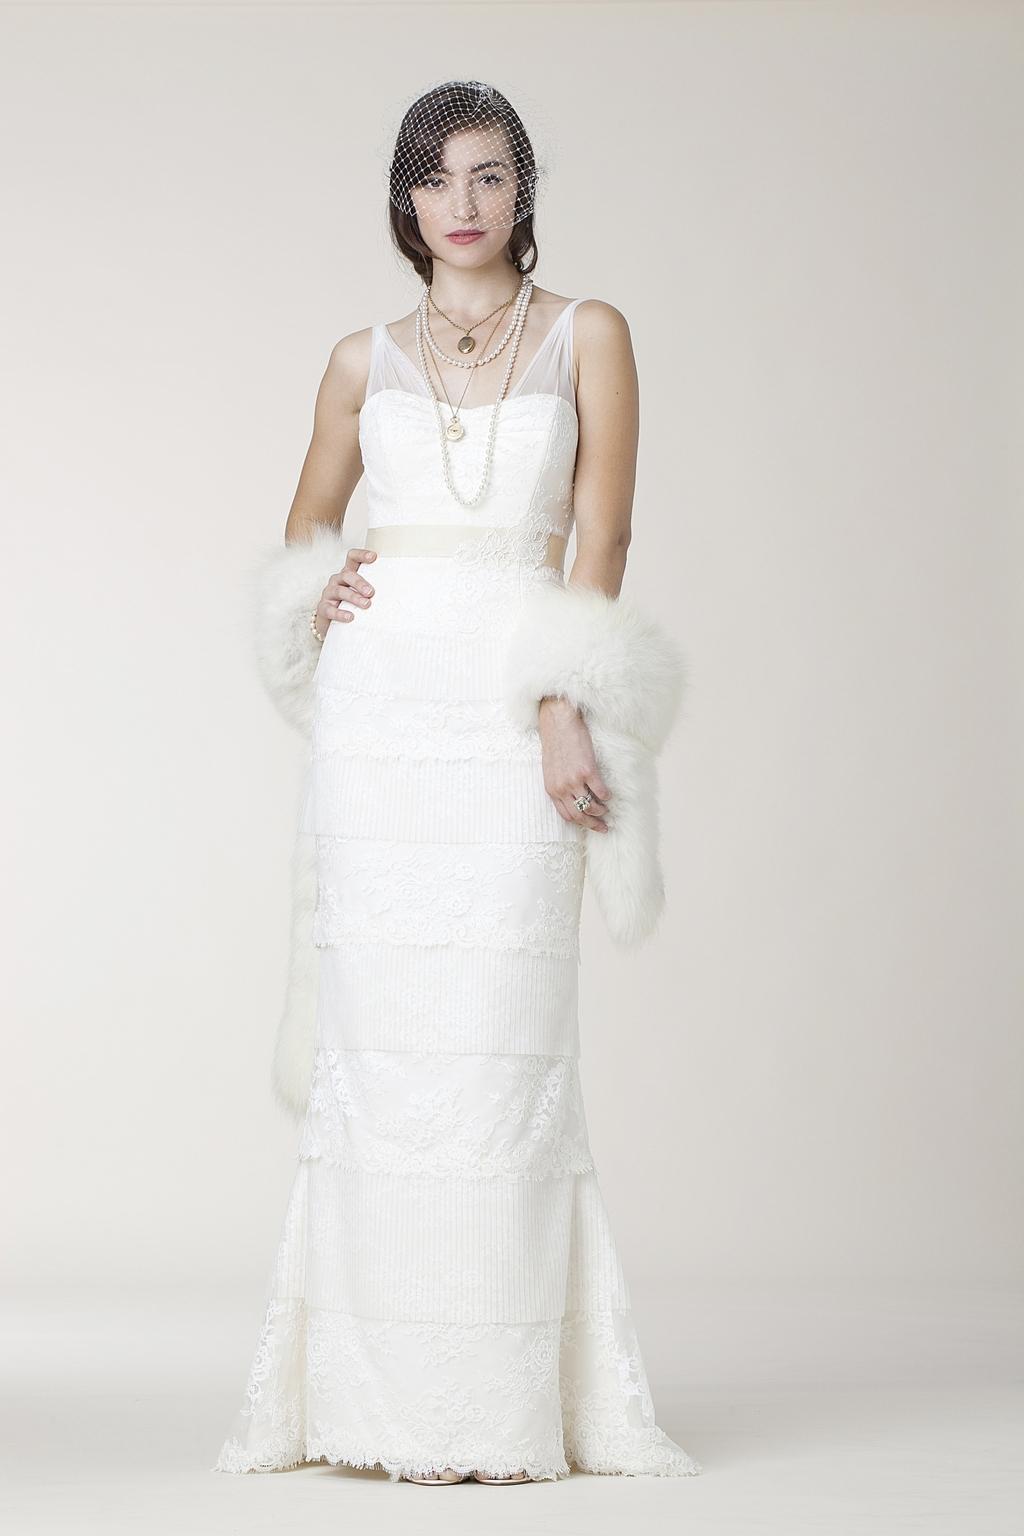 Valencia-2011-wedding-dress-amy-kuschel.full